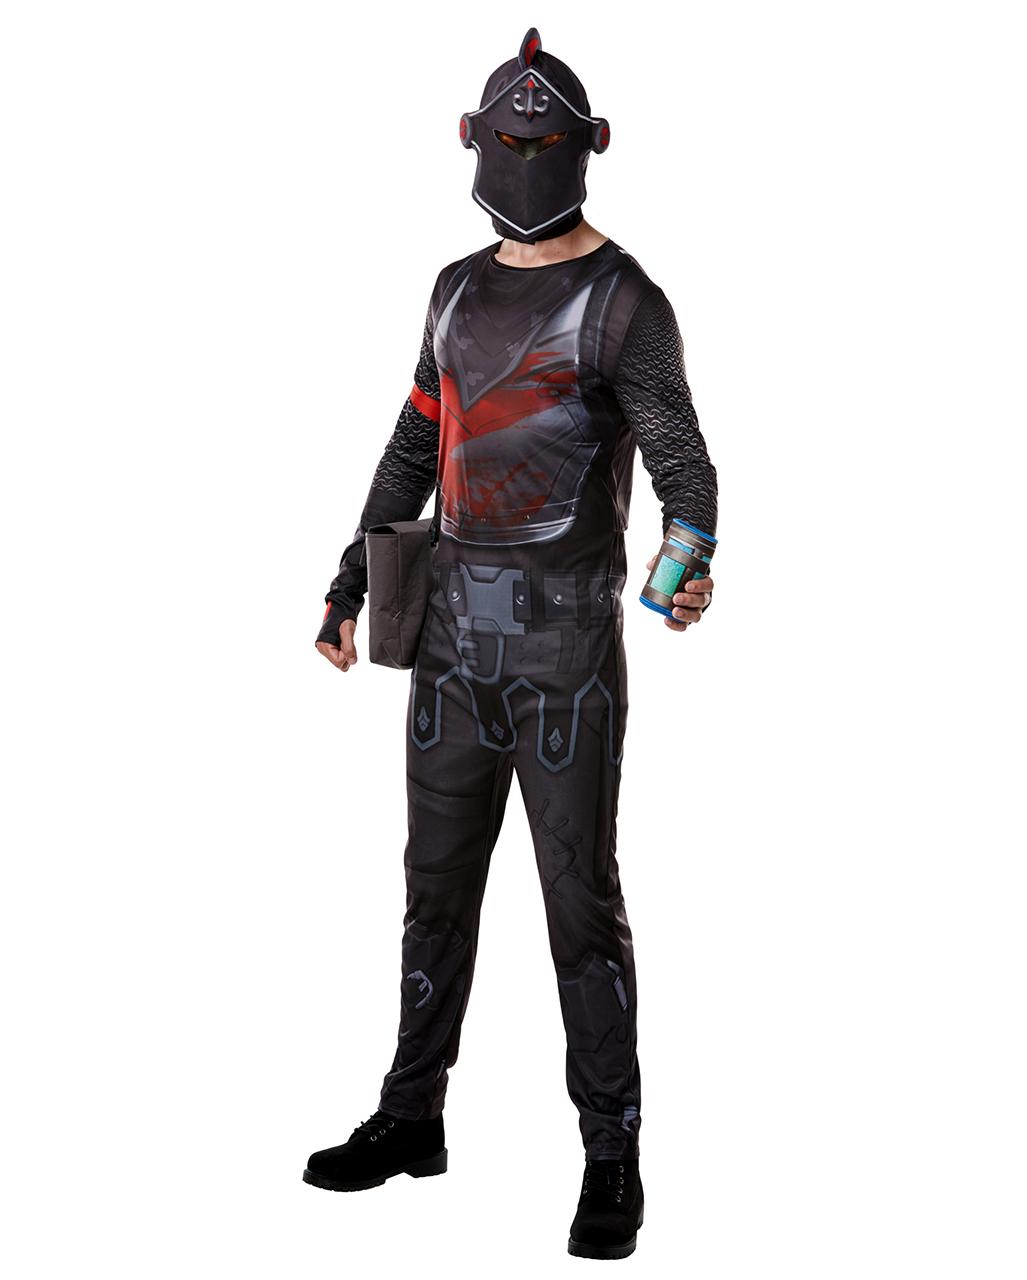 fortnite black knight kostum - coole fortnite bilder schwarzer ritter